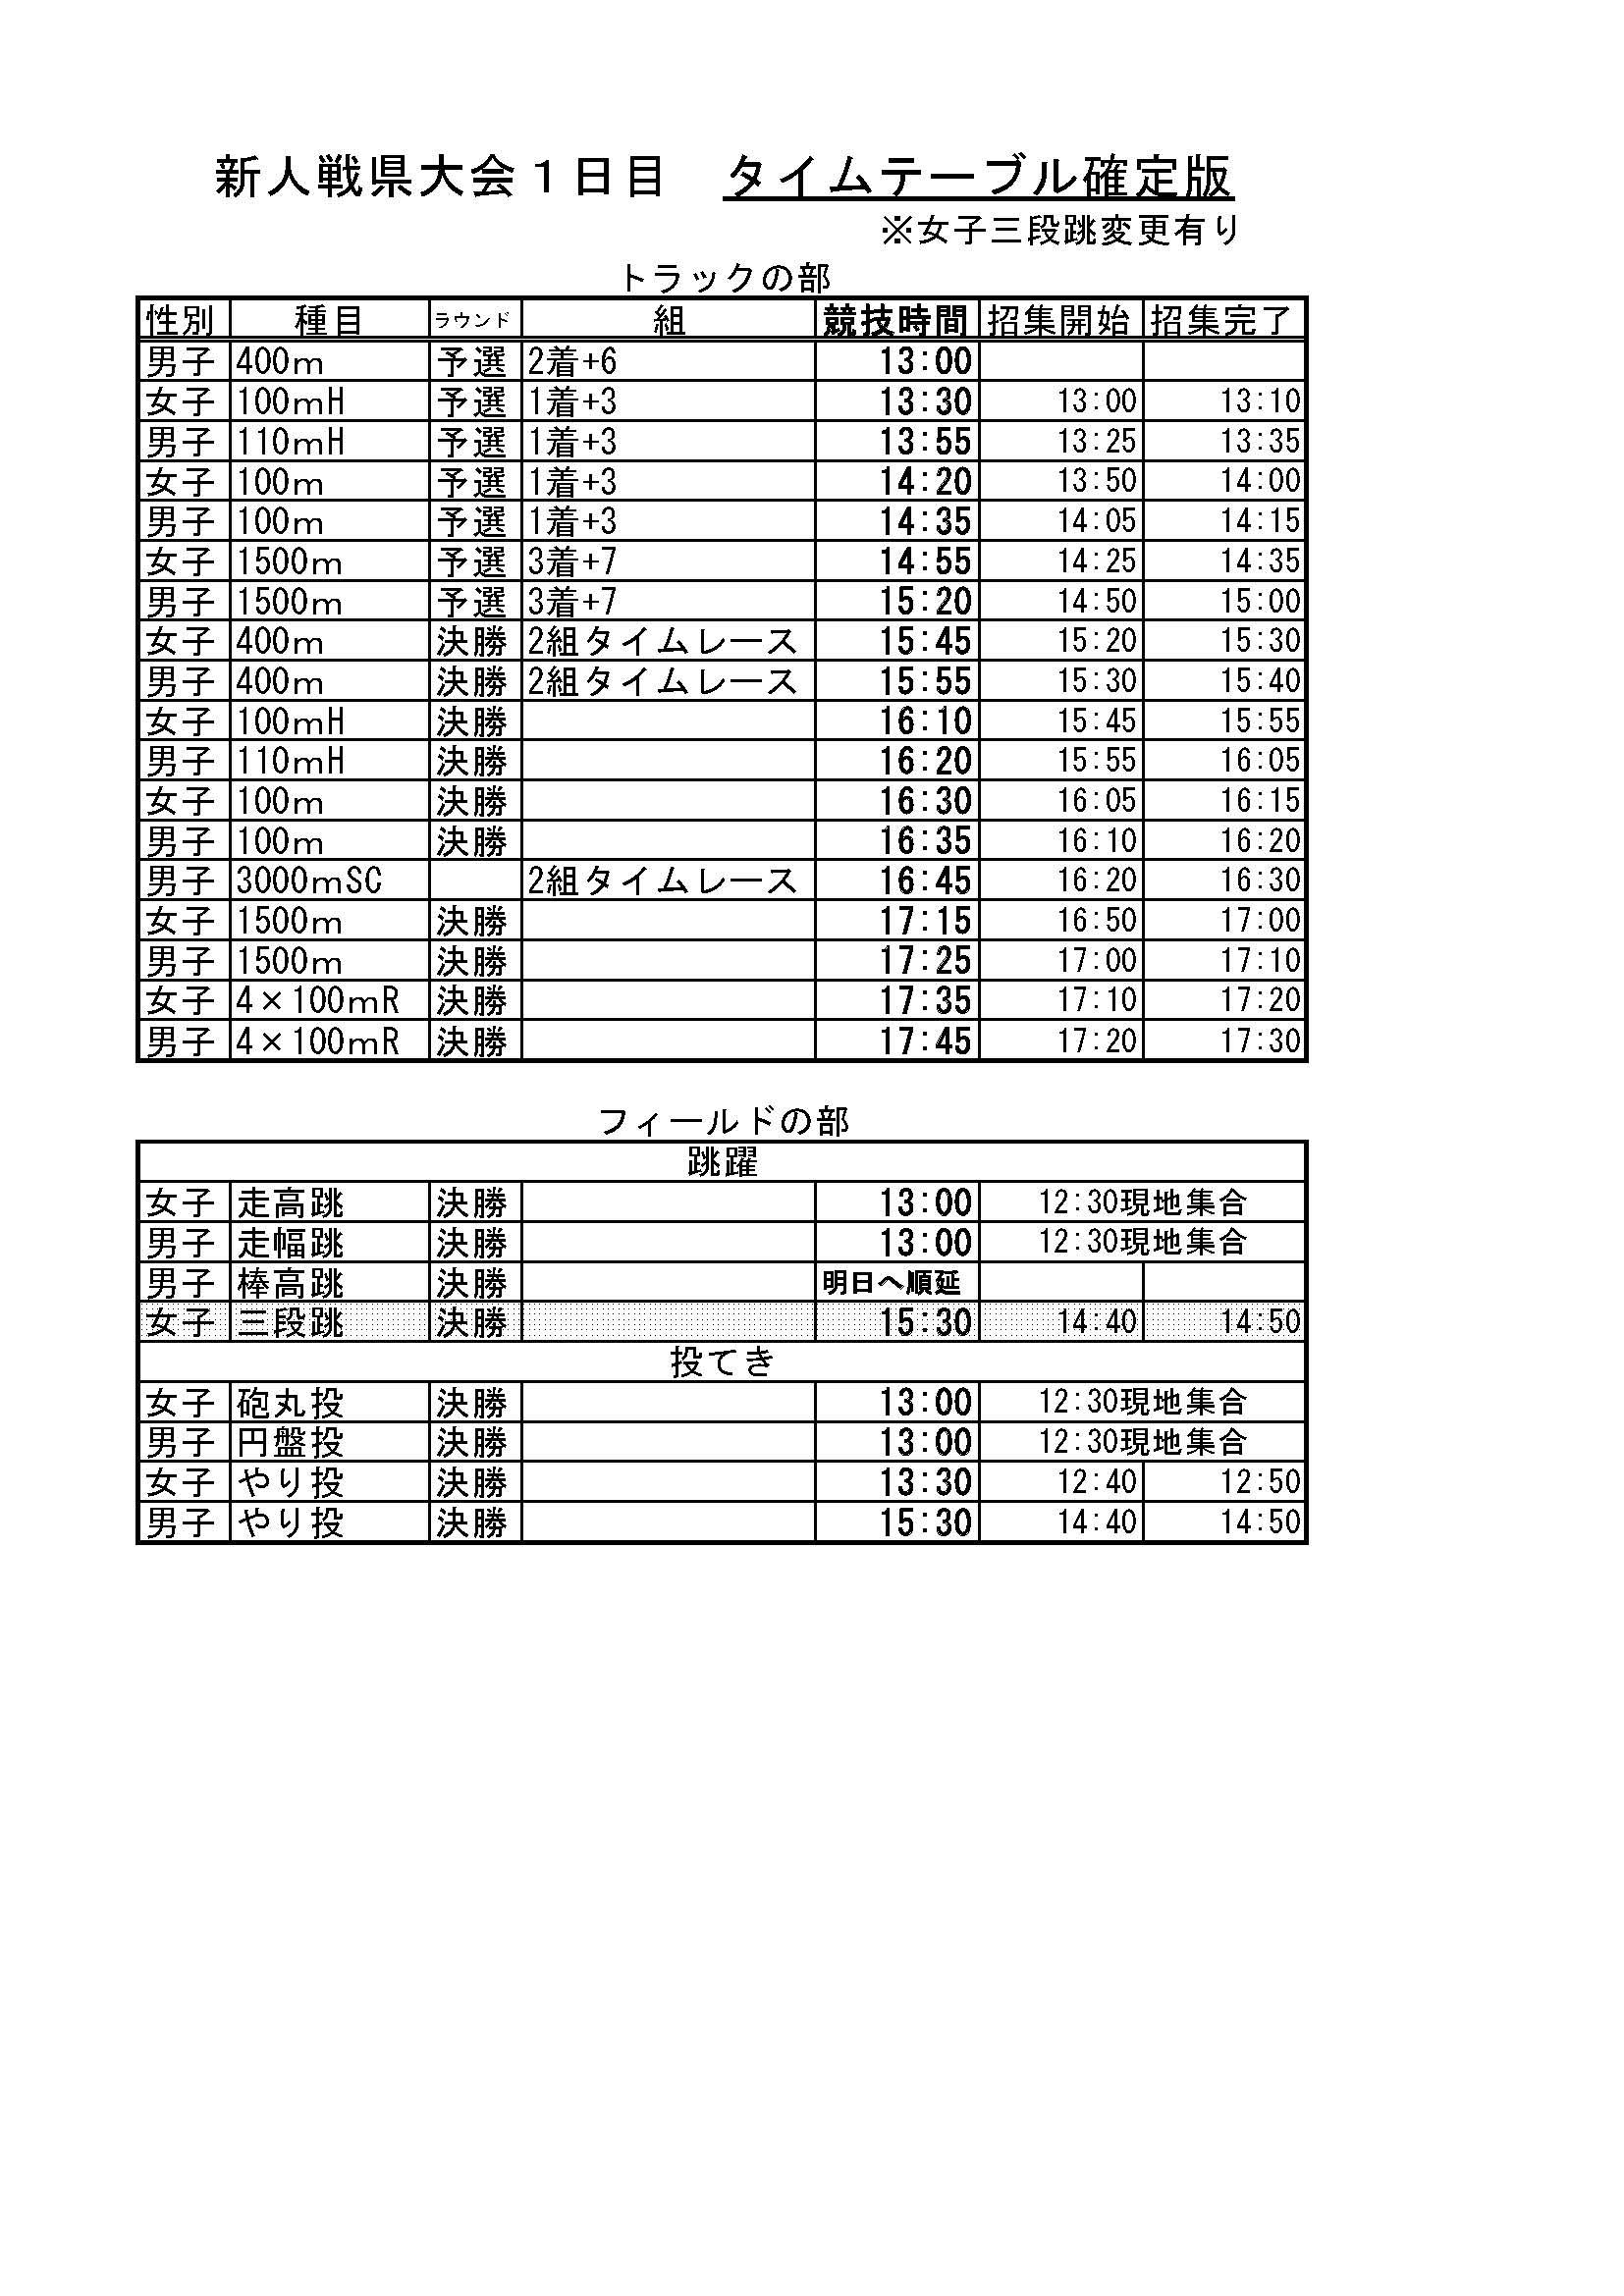 160924hen (1)